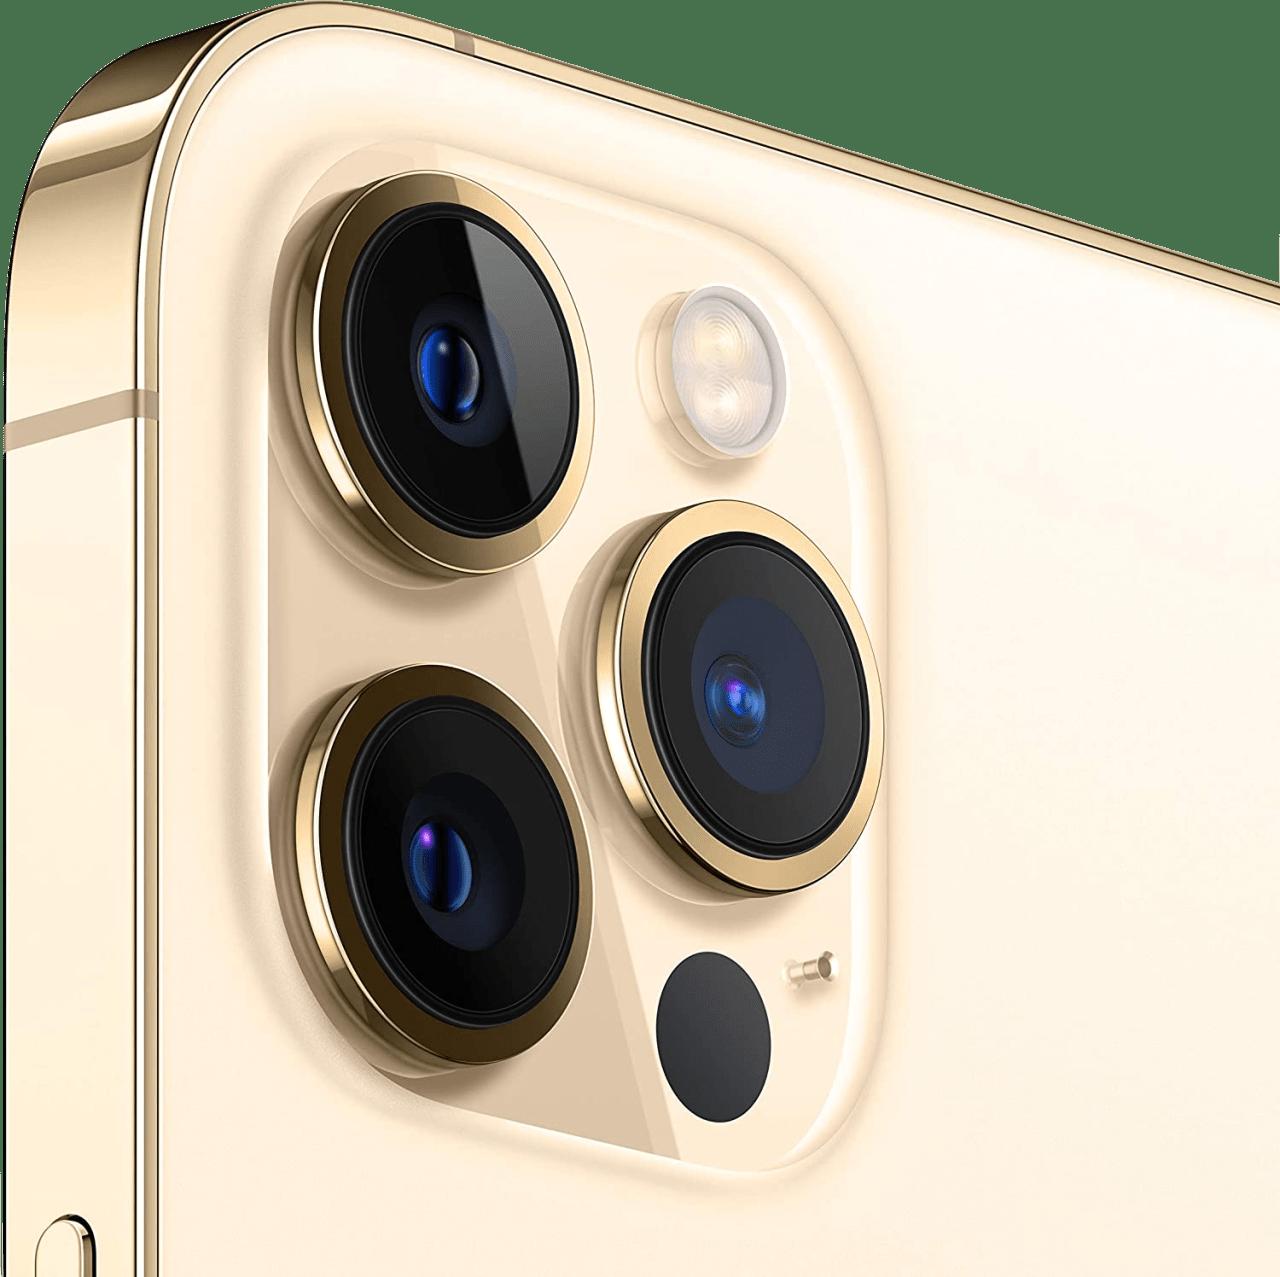 Gold Apple iPhone 12 Pro Max 512GB.2